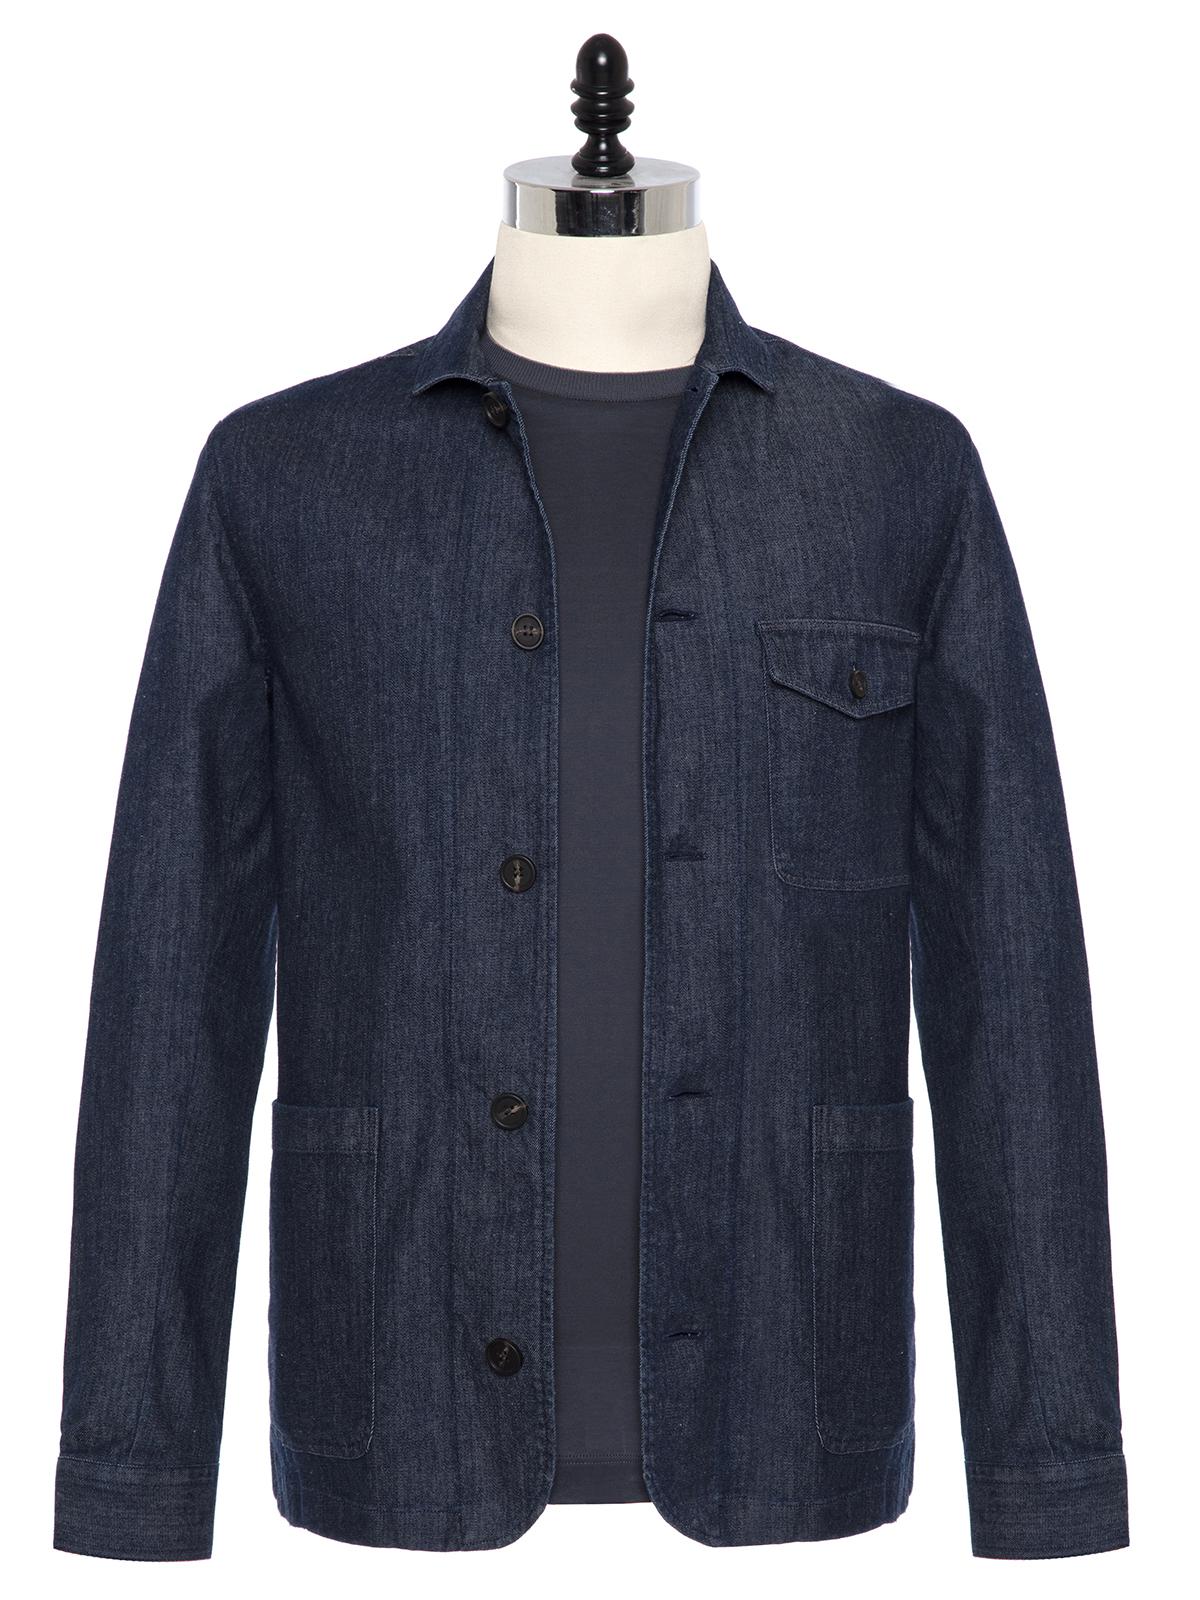 Germirli - Germirli Lacivert Denim Tailor Fit Ceket Gömlek